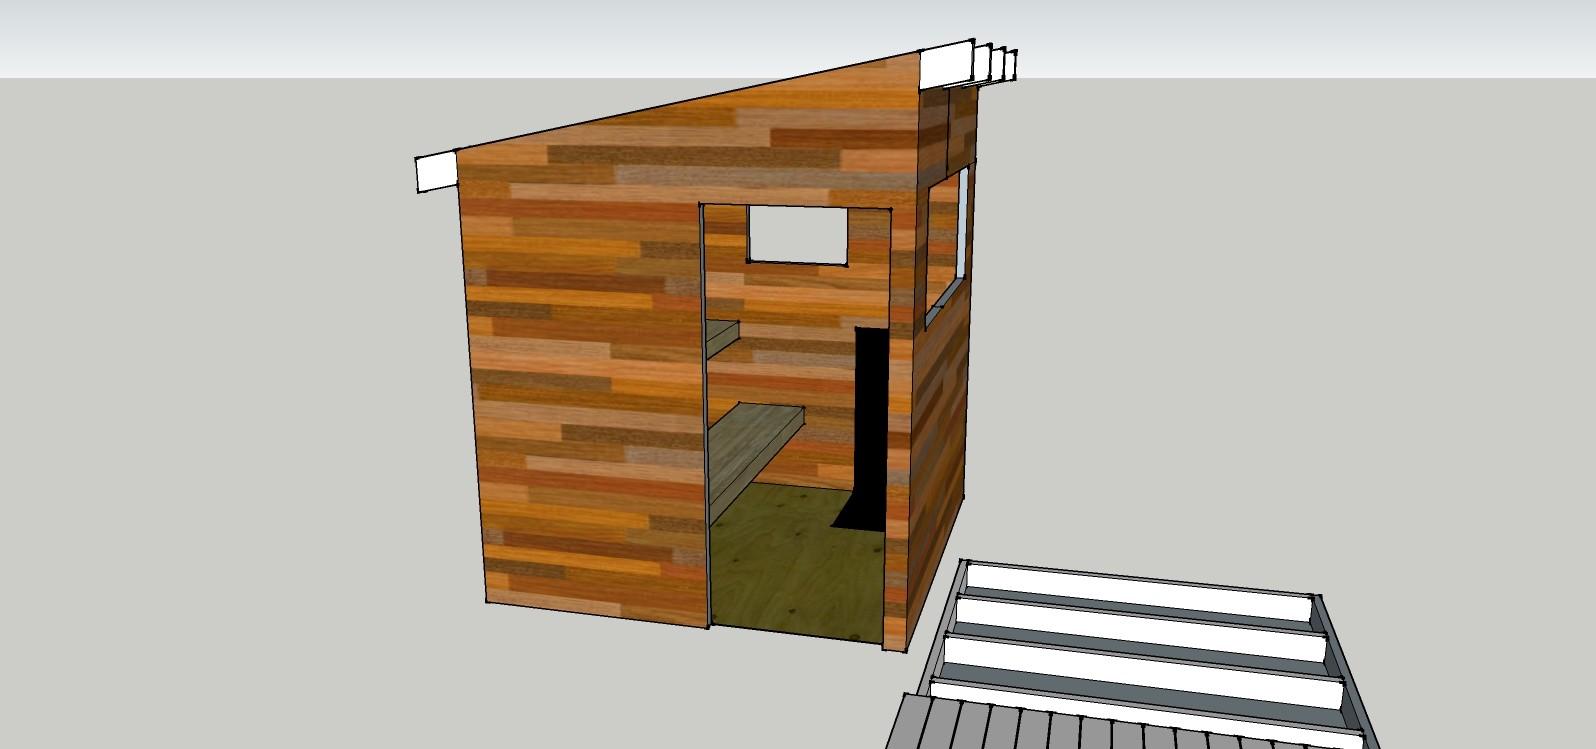 Bygga enkel fristående vedeldad bastu | Byggahus.se